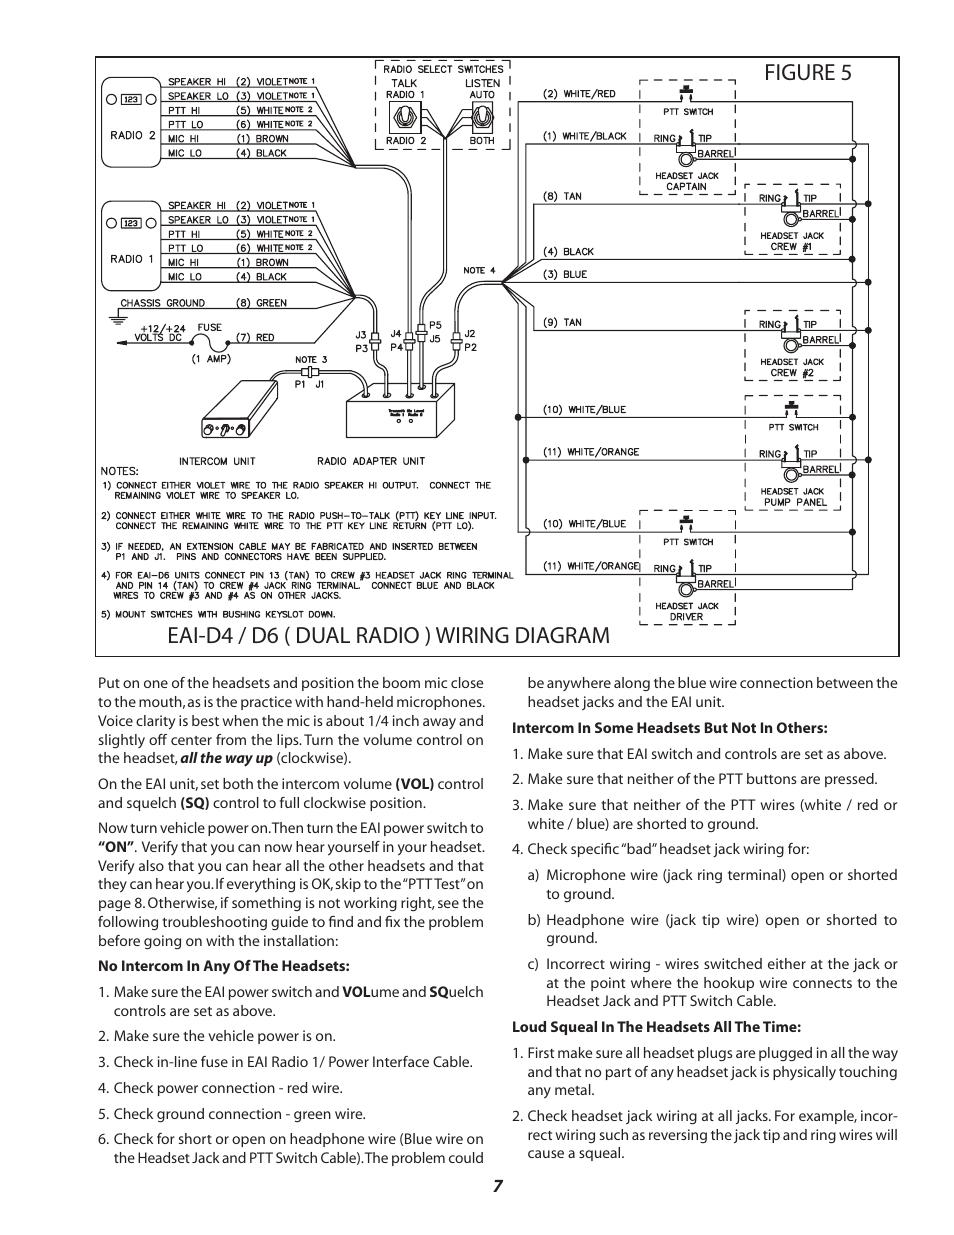 sigtronics wiring diagram